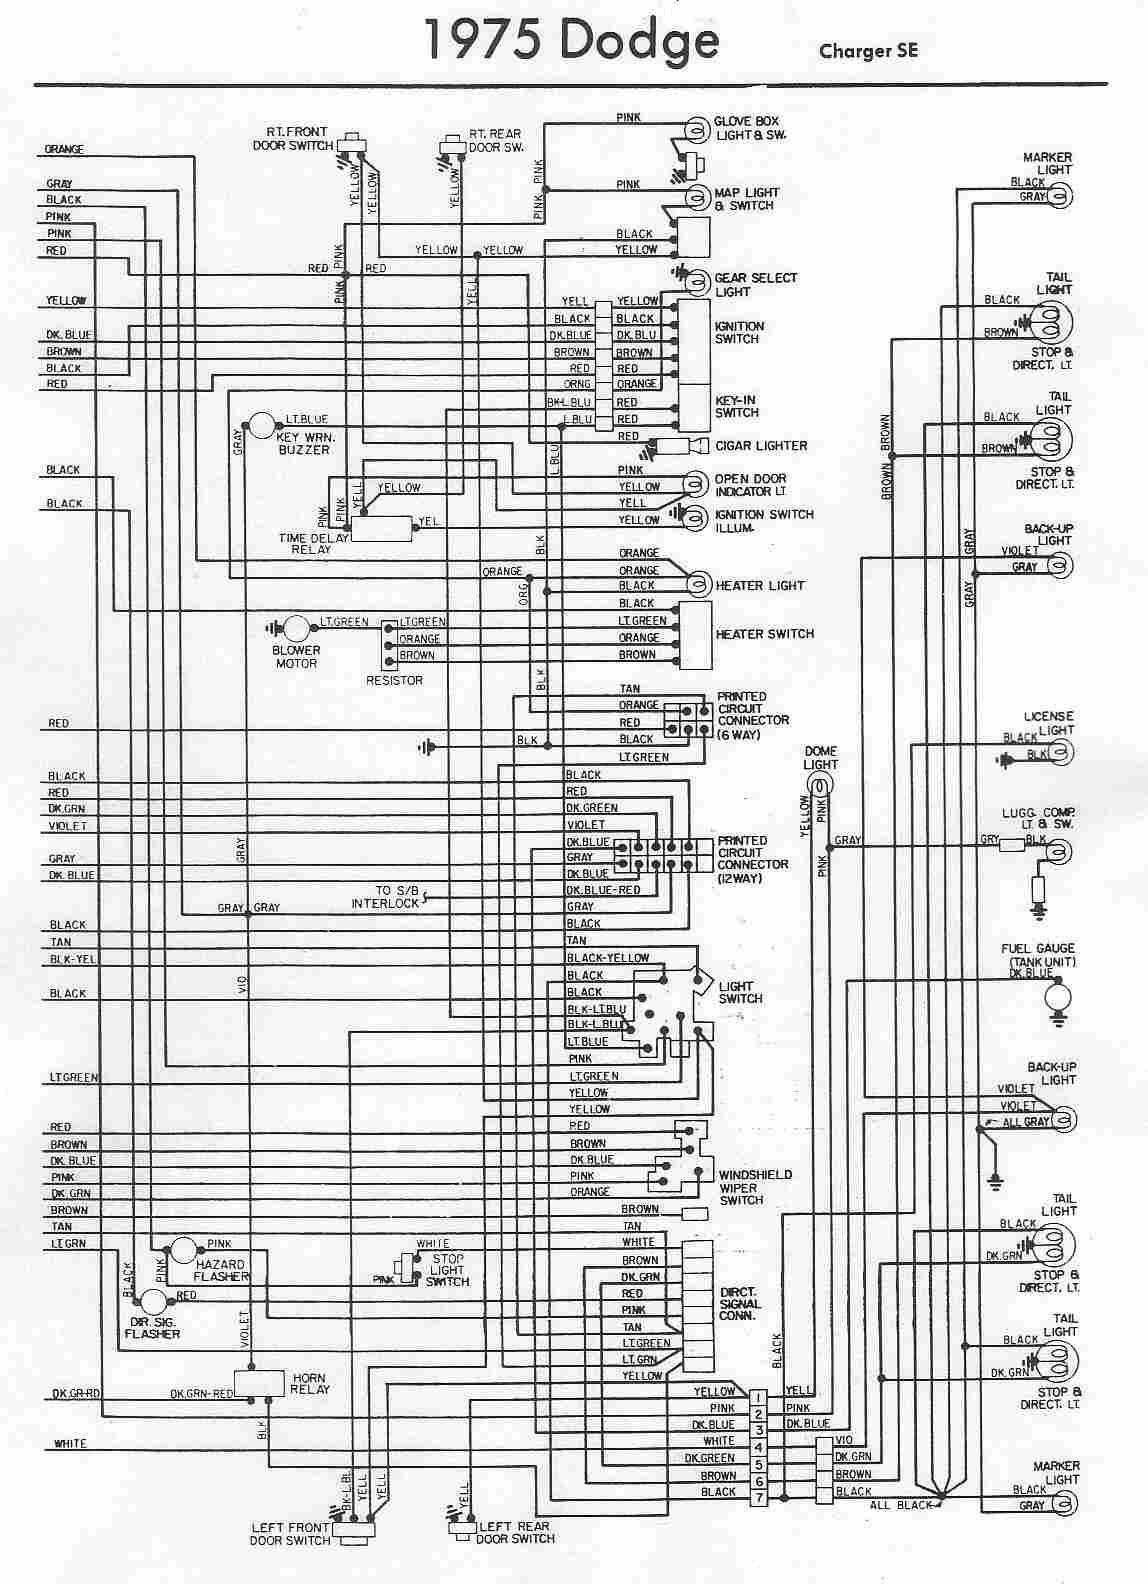 medium resolution of 1975 dodge wiring diagram wiring diagram for you1975 dodge wiring diagram 4